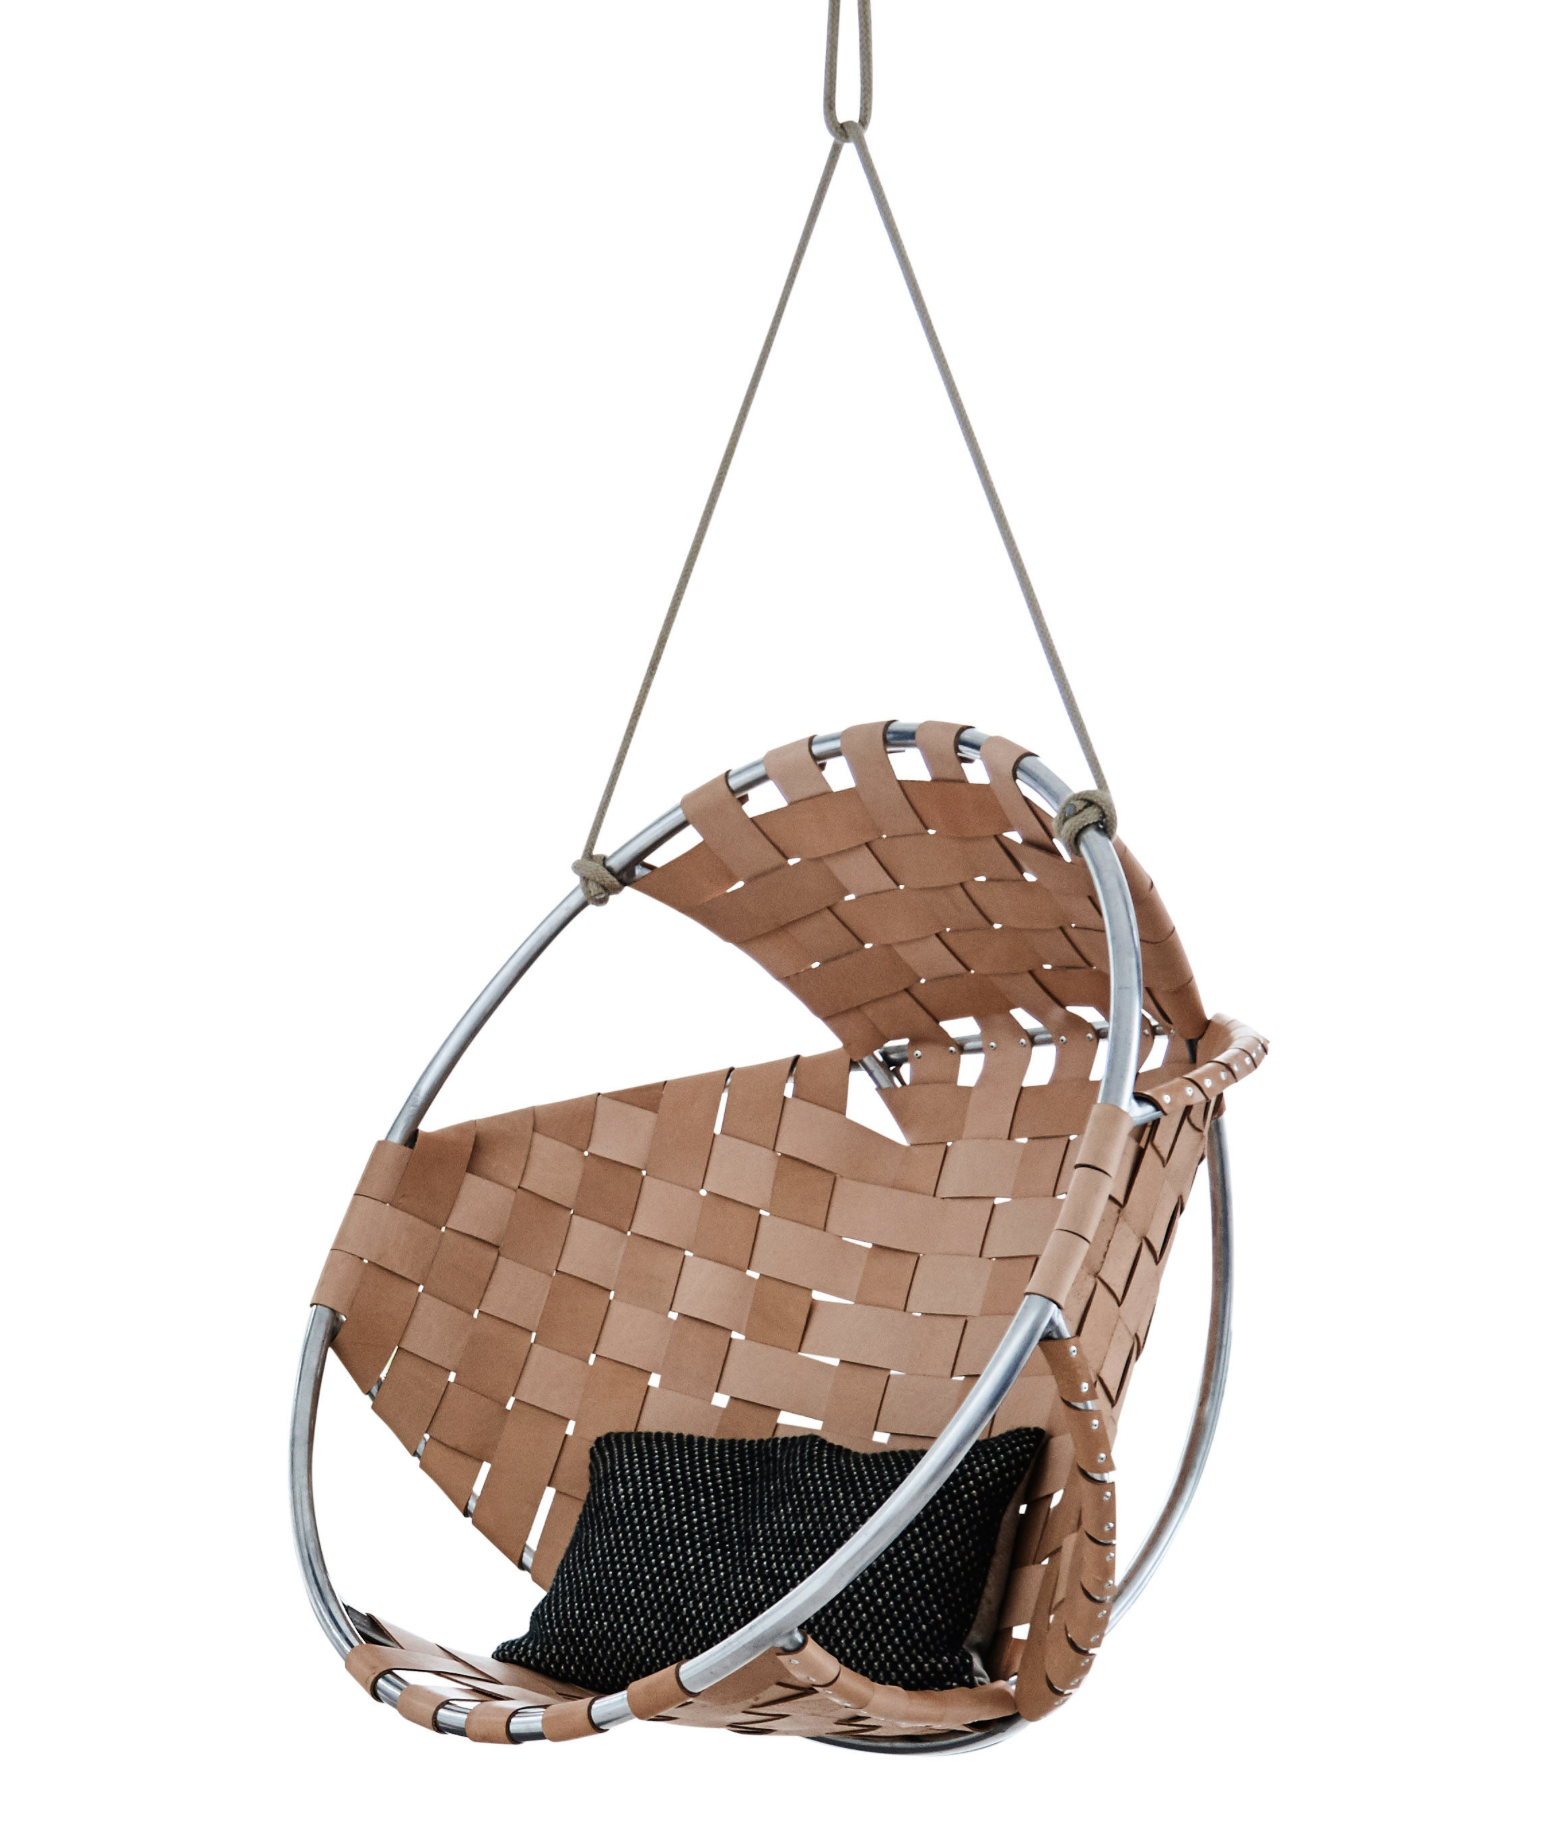 Cocoon Hanging Armchair in Leather, Trimm Copenhagen   Made In Design £2,111